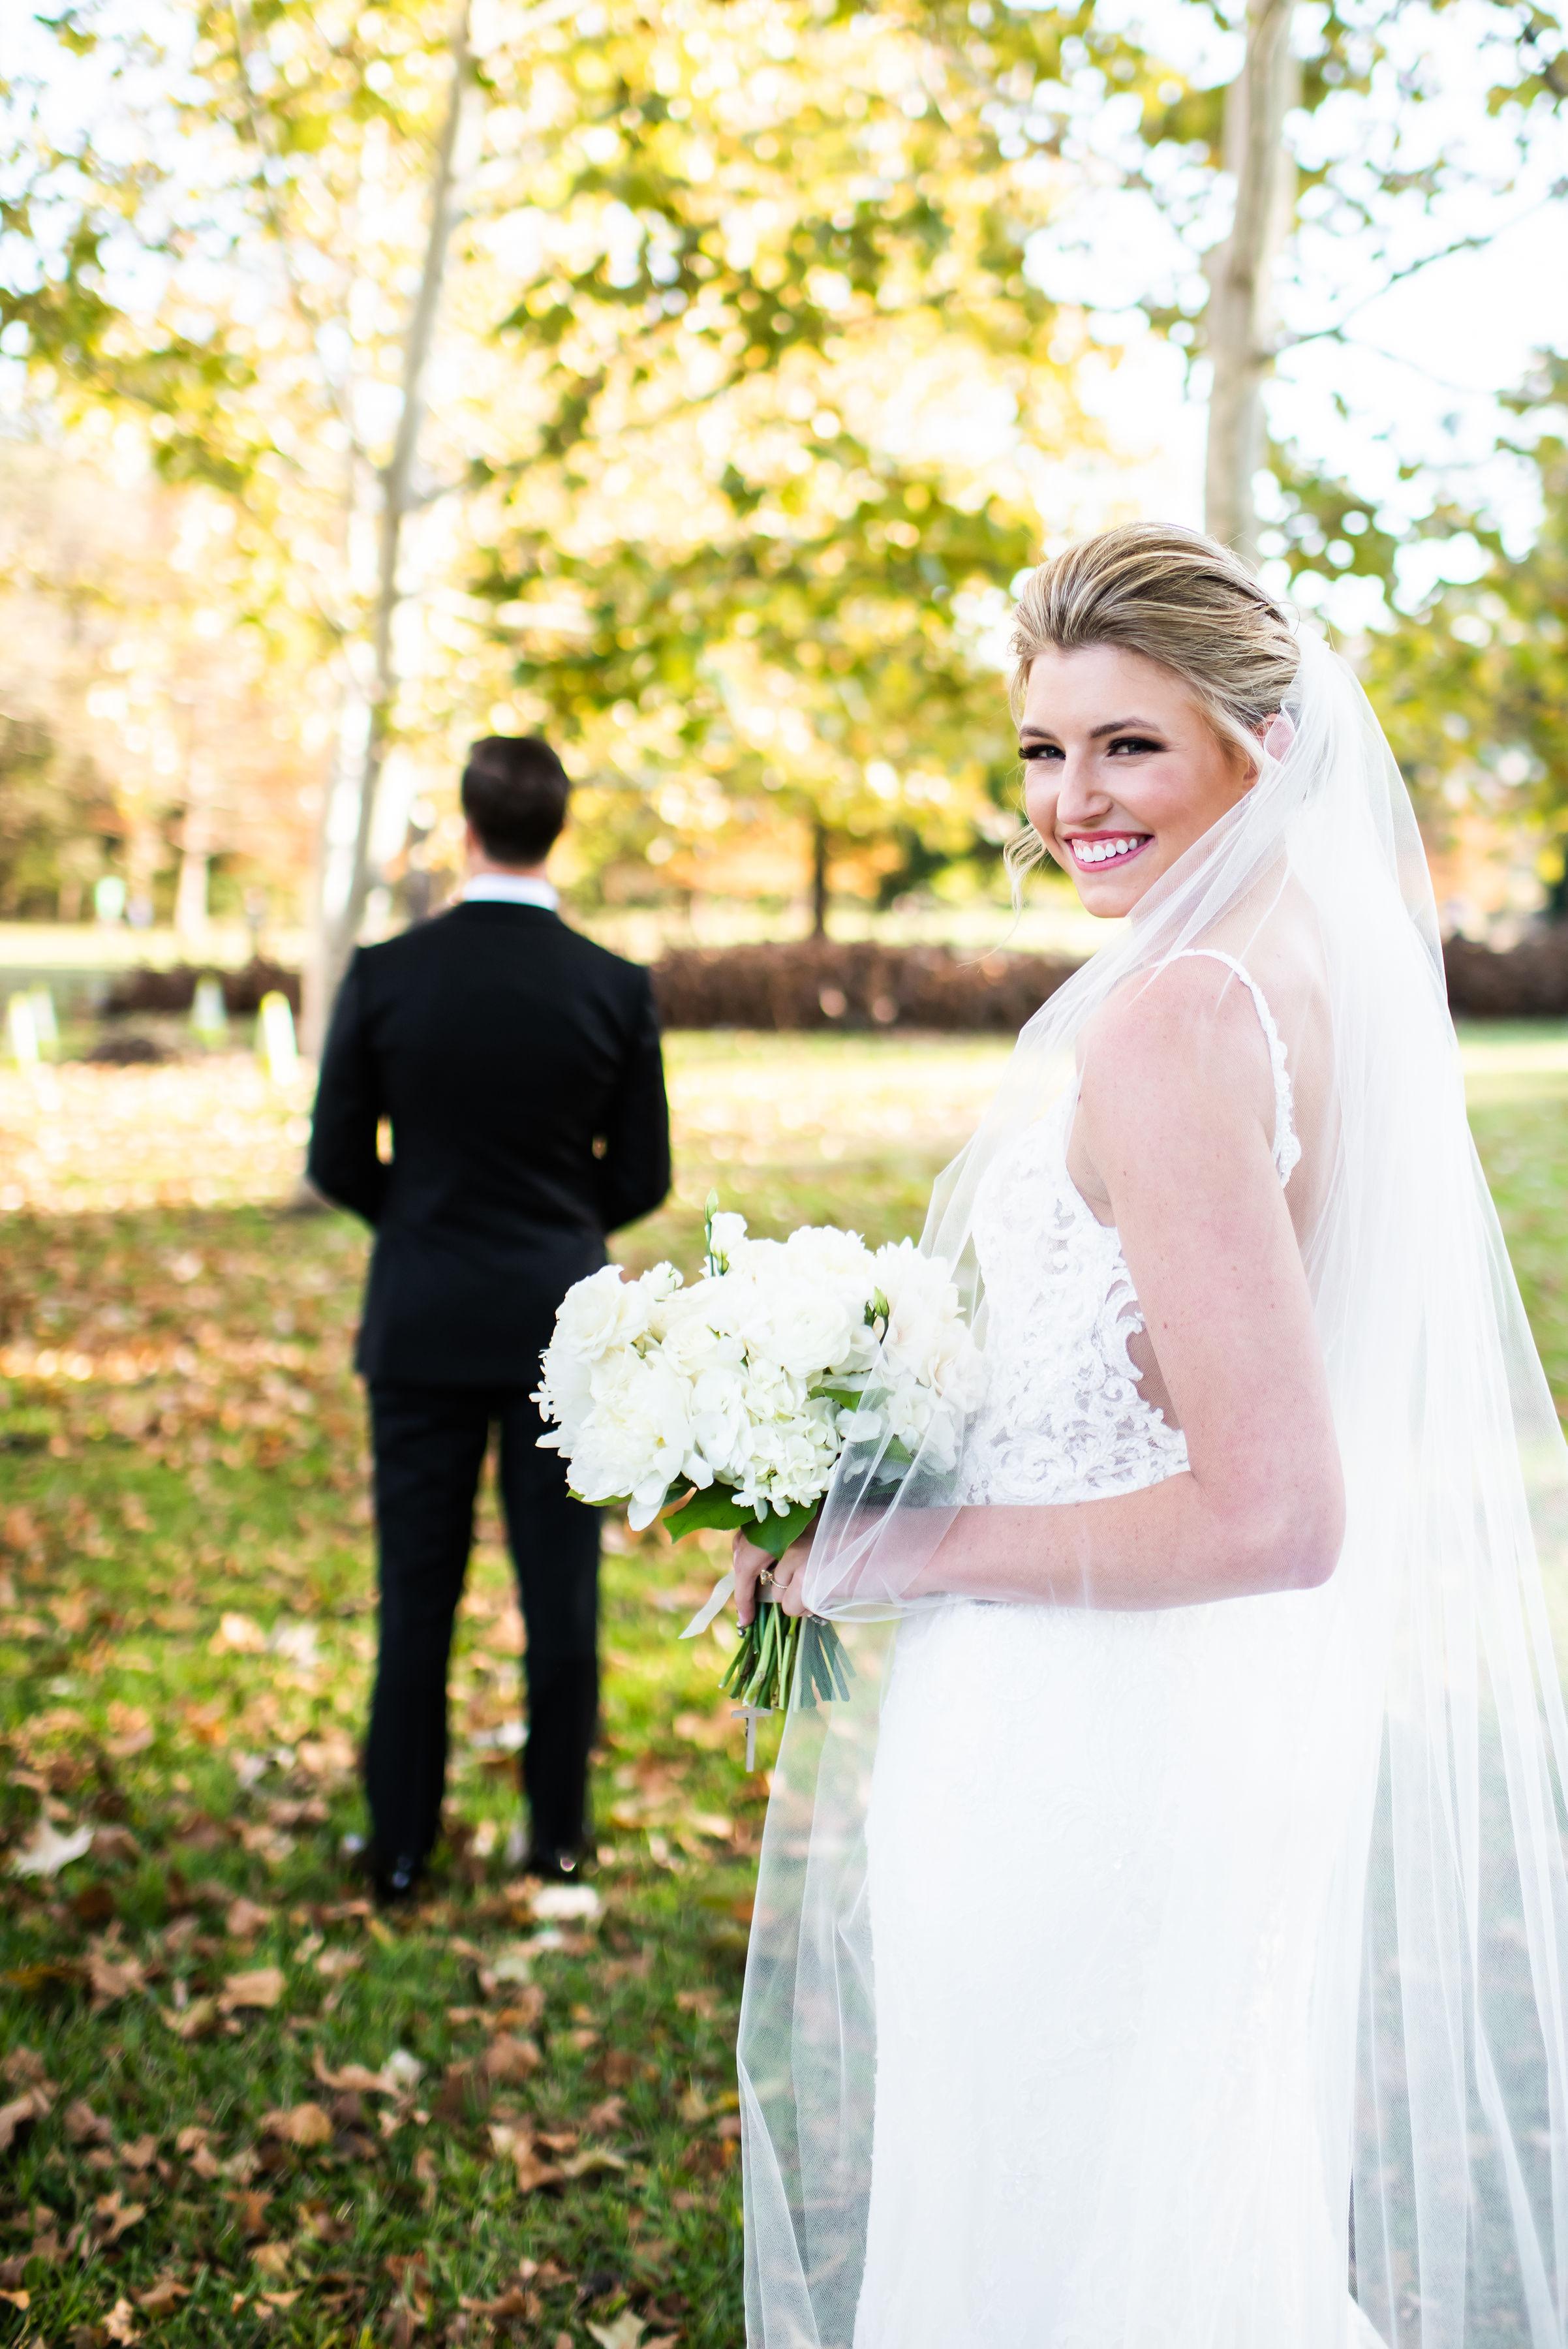 Andrea Elizabeth Photography